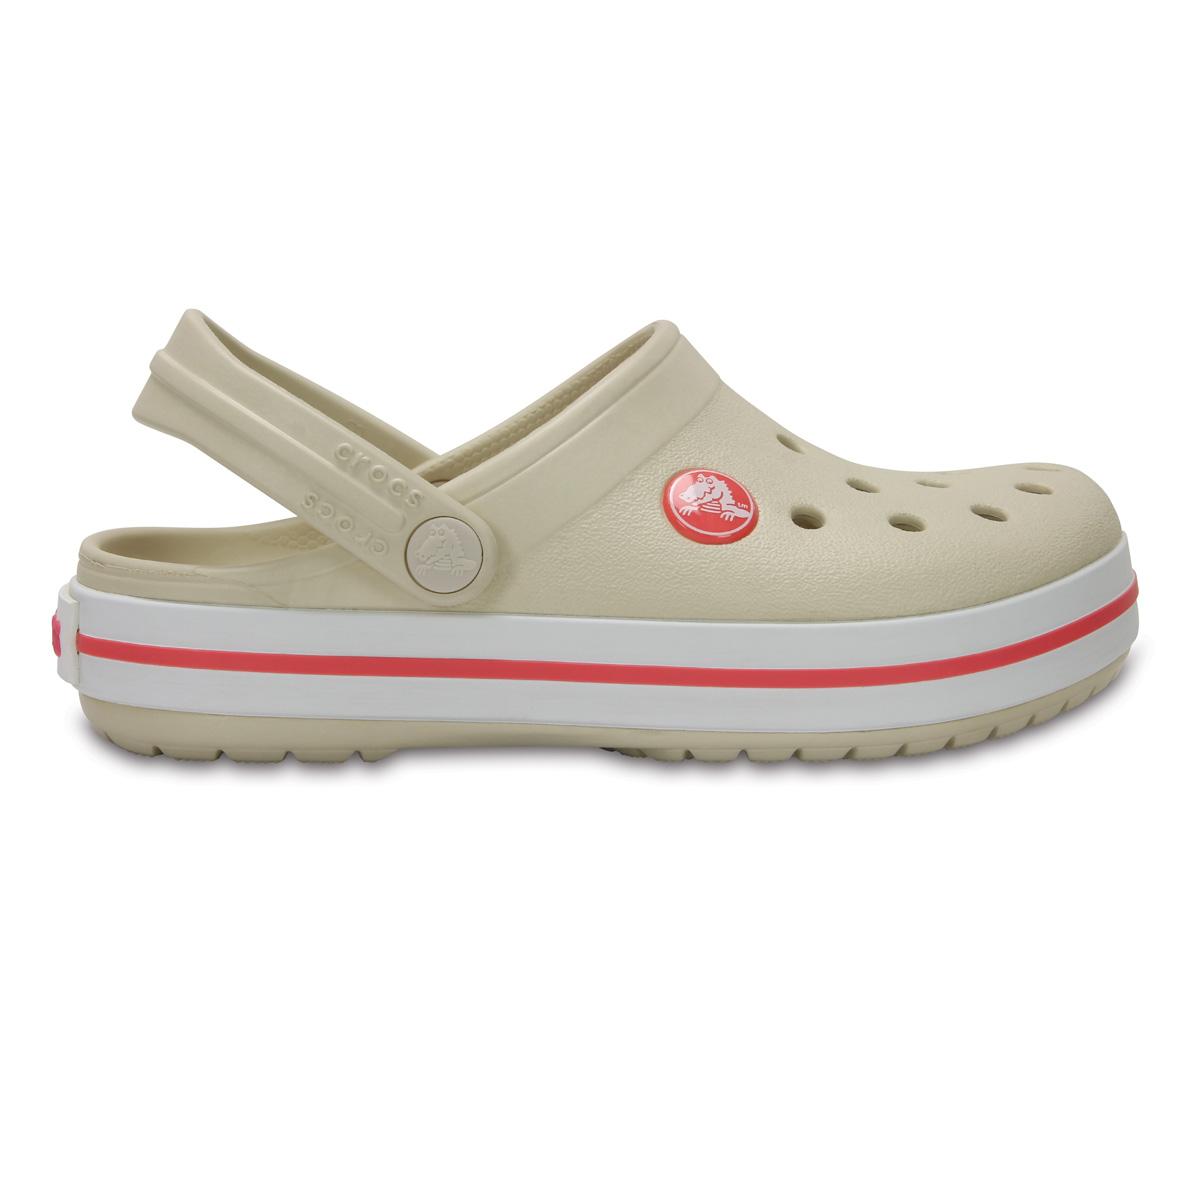 Crocs Crocband Clog K - Alçı/Kavun